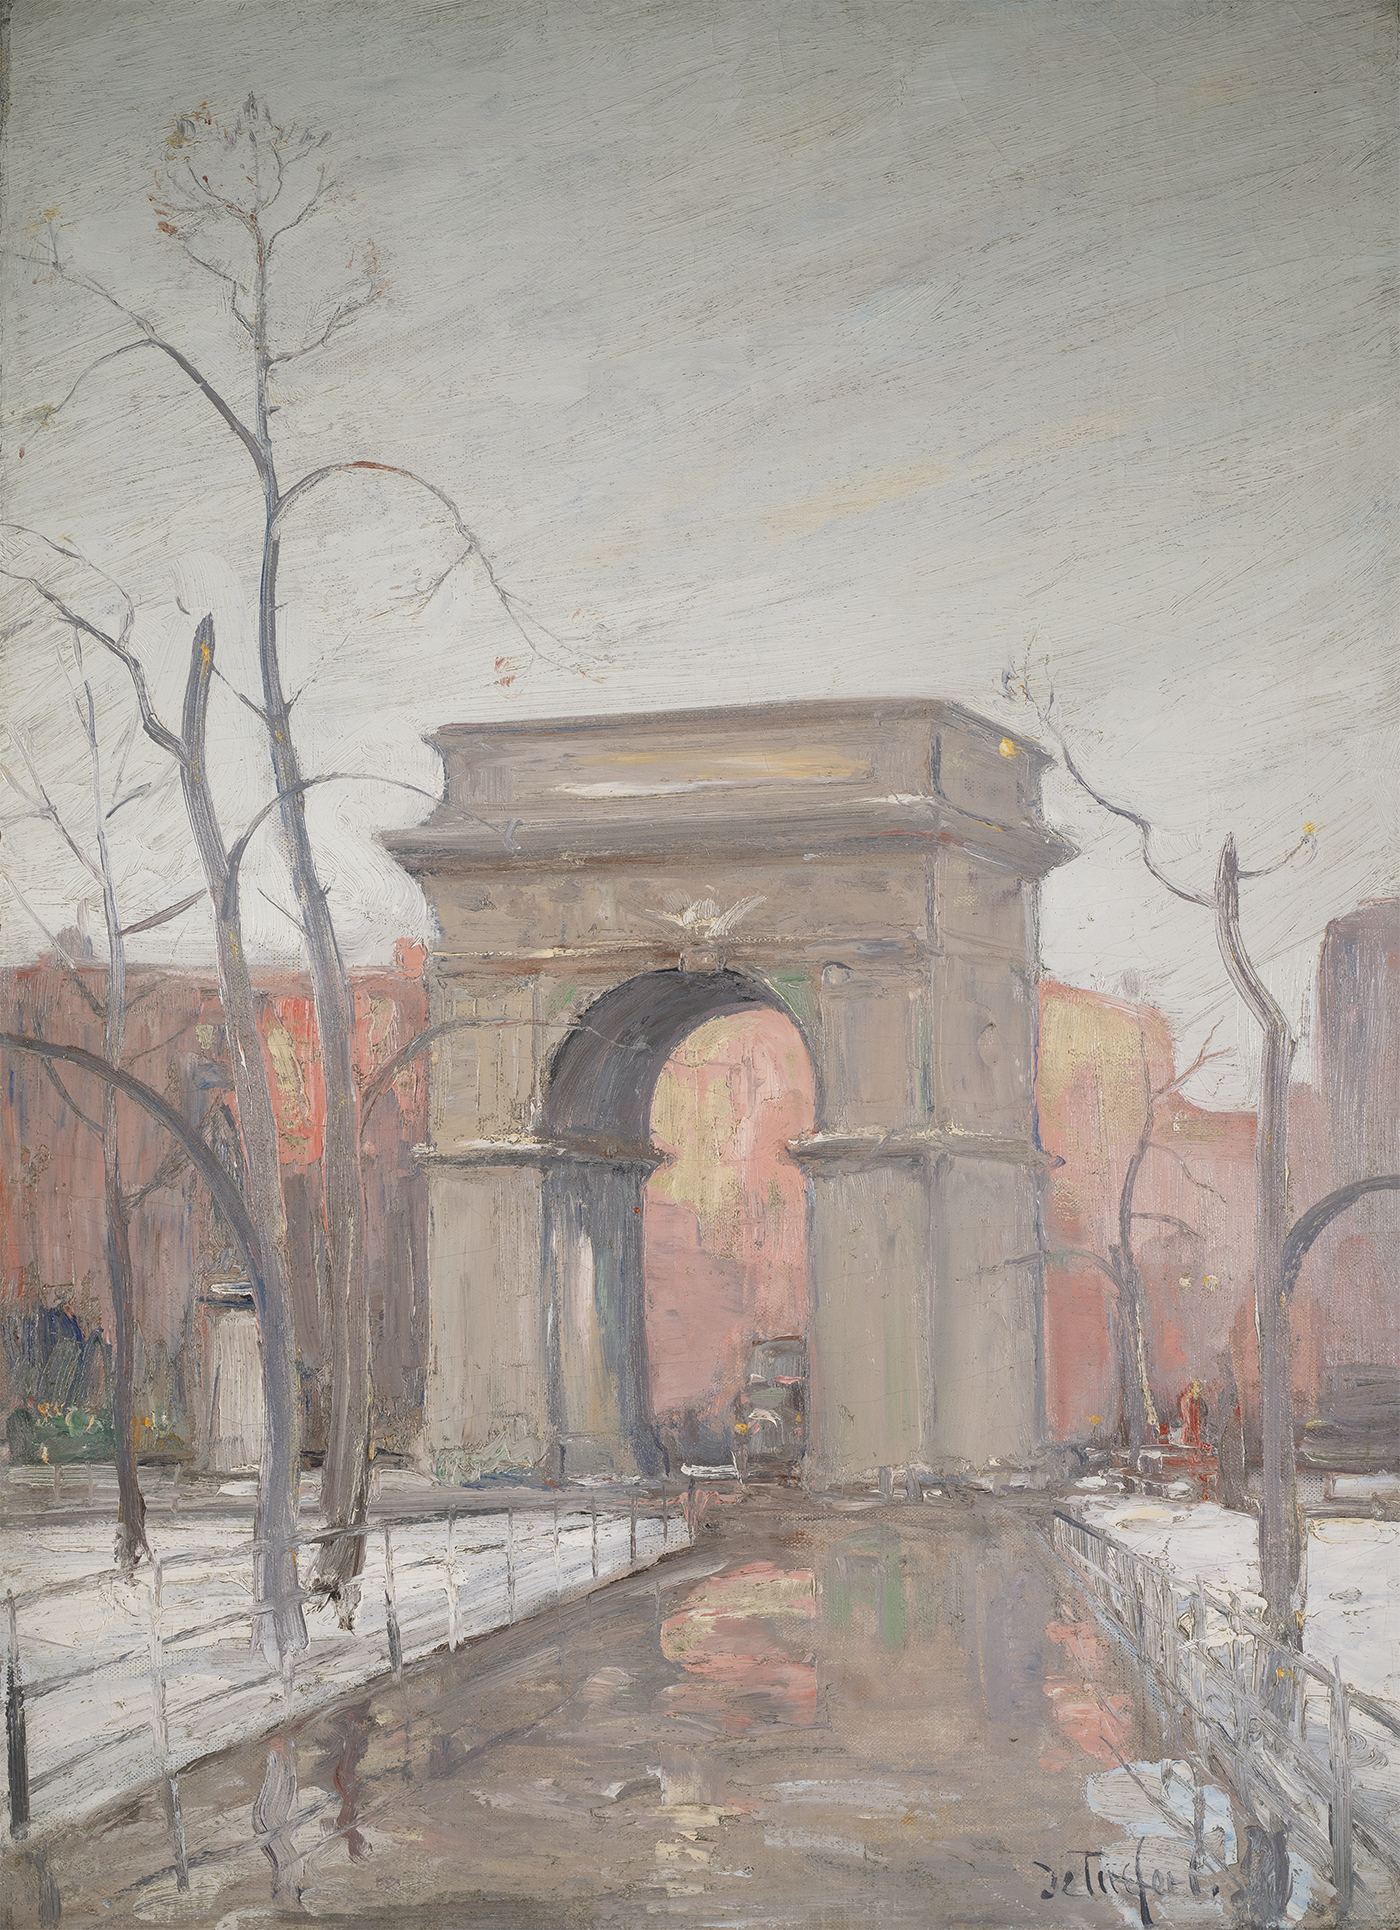 de Tirefort-Winter in Washington Square Park